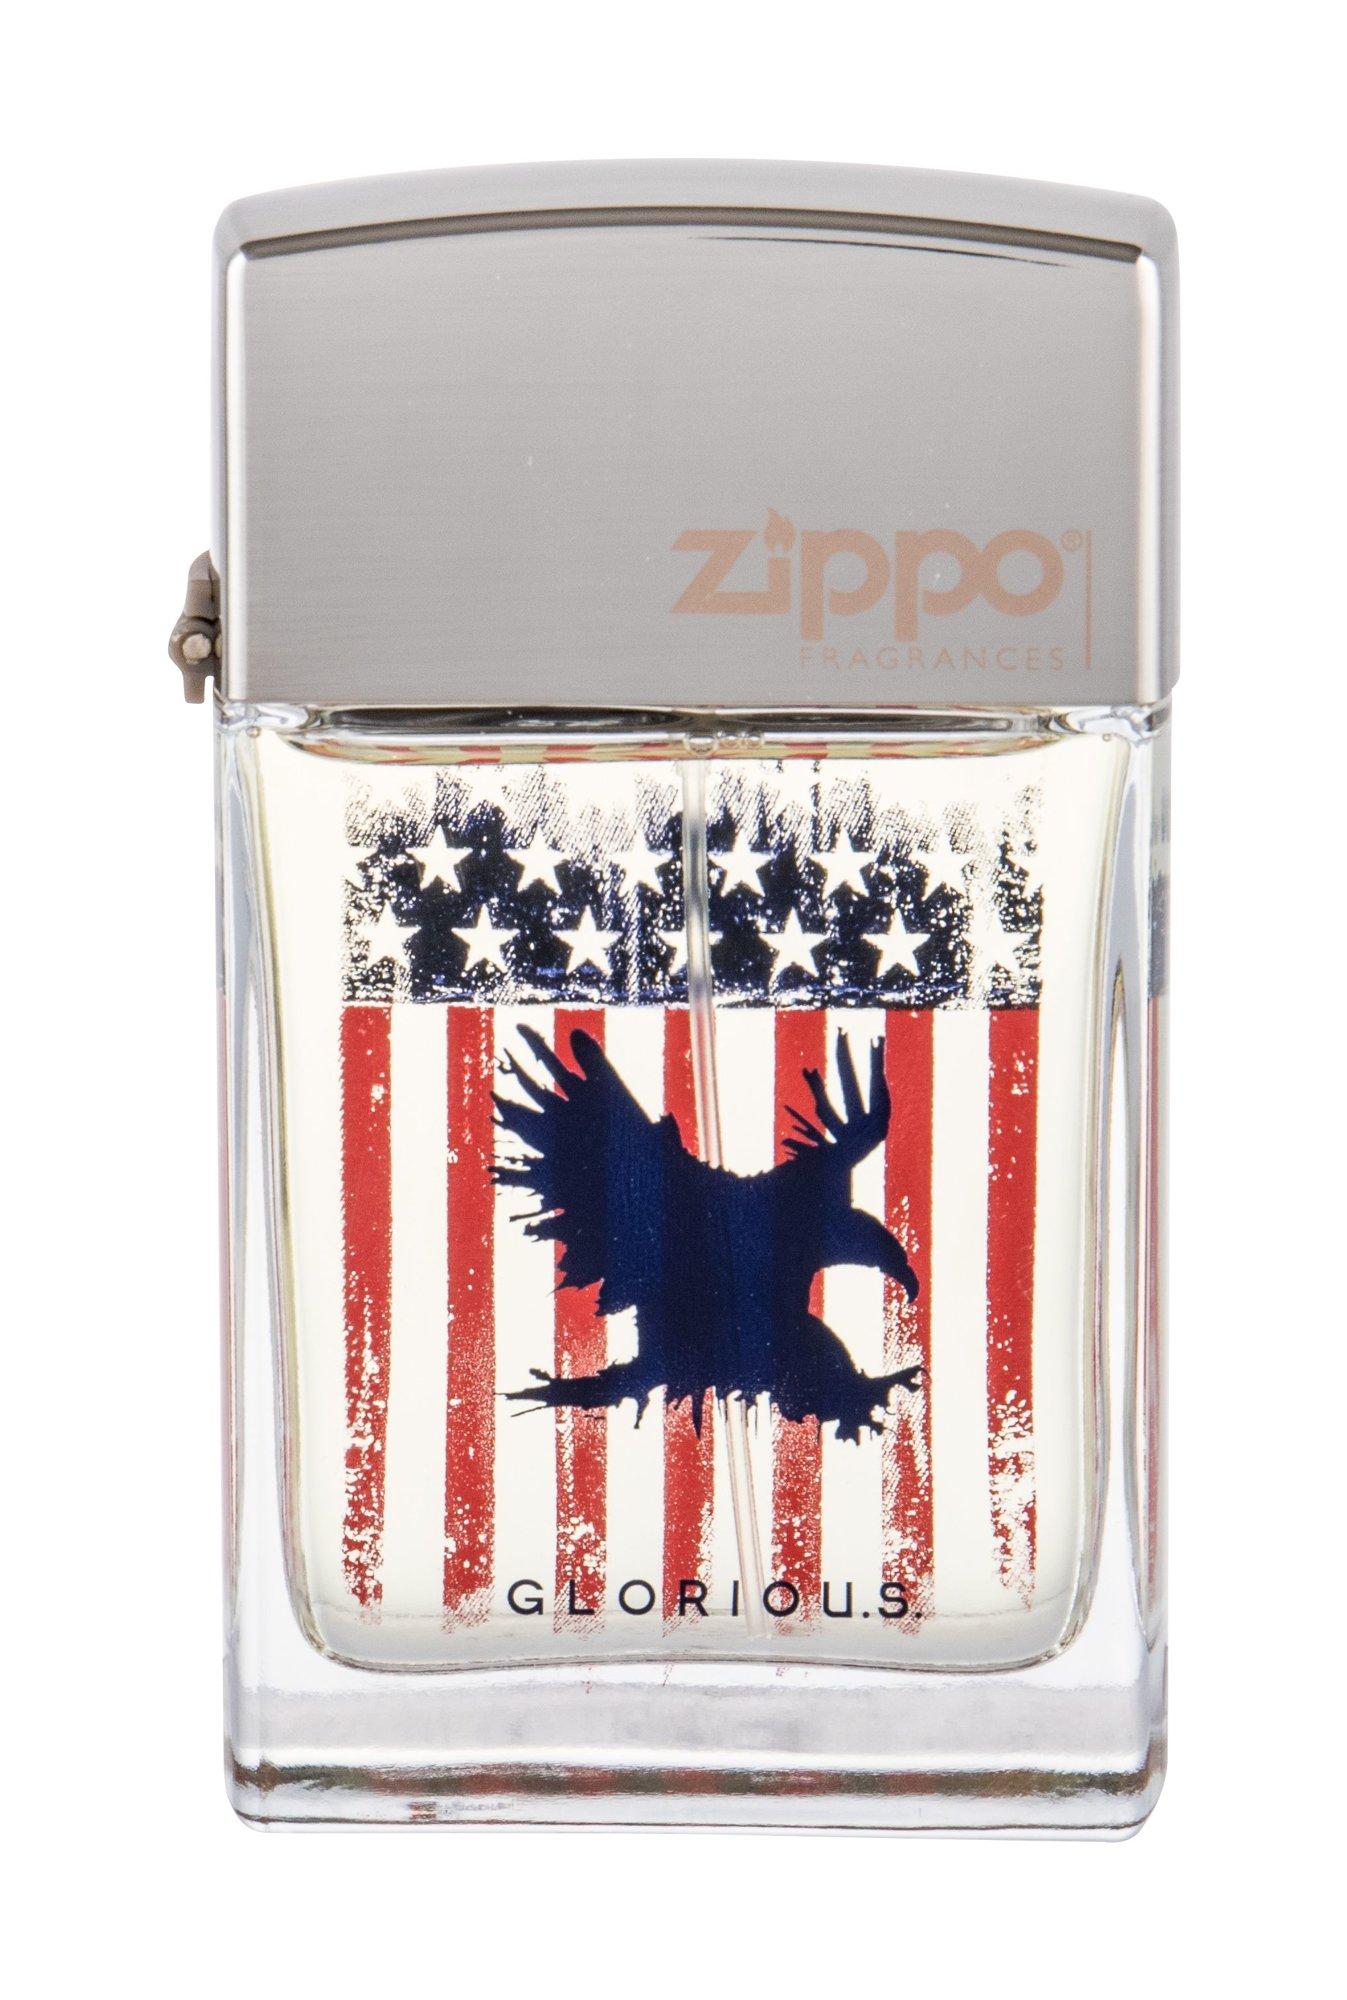 Zippo Fragrances Gloriou.s., Toaletná voda 75ml, Tester